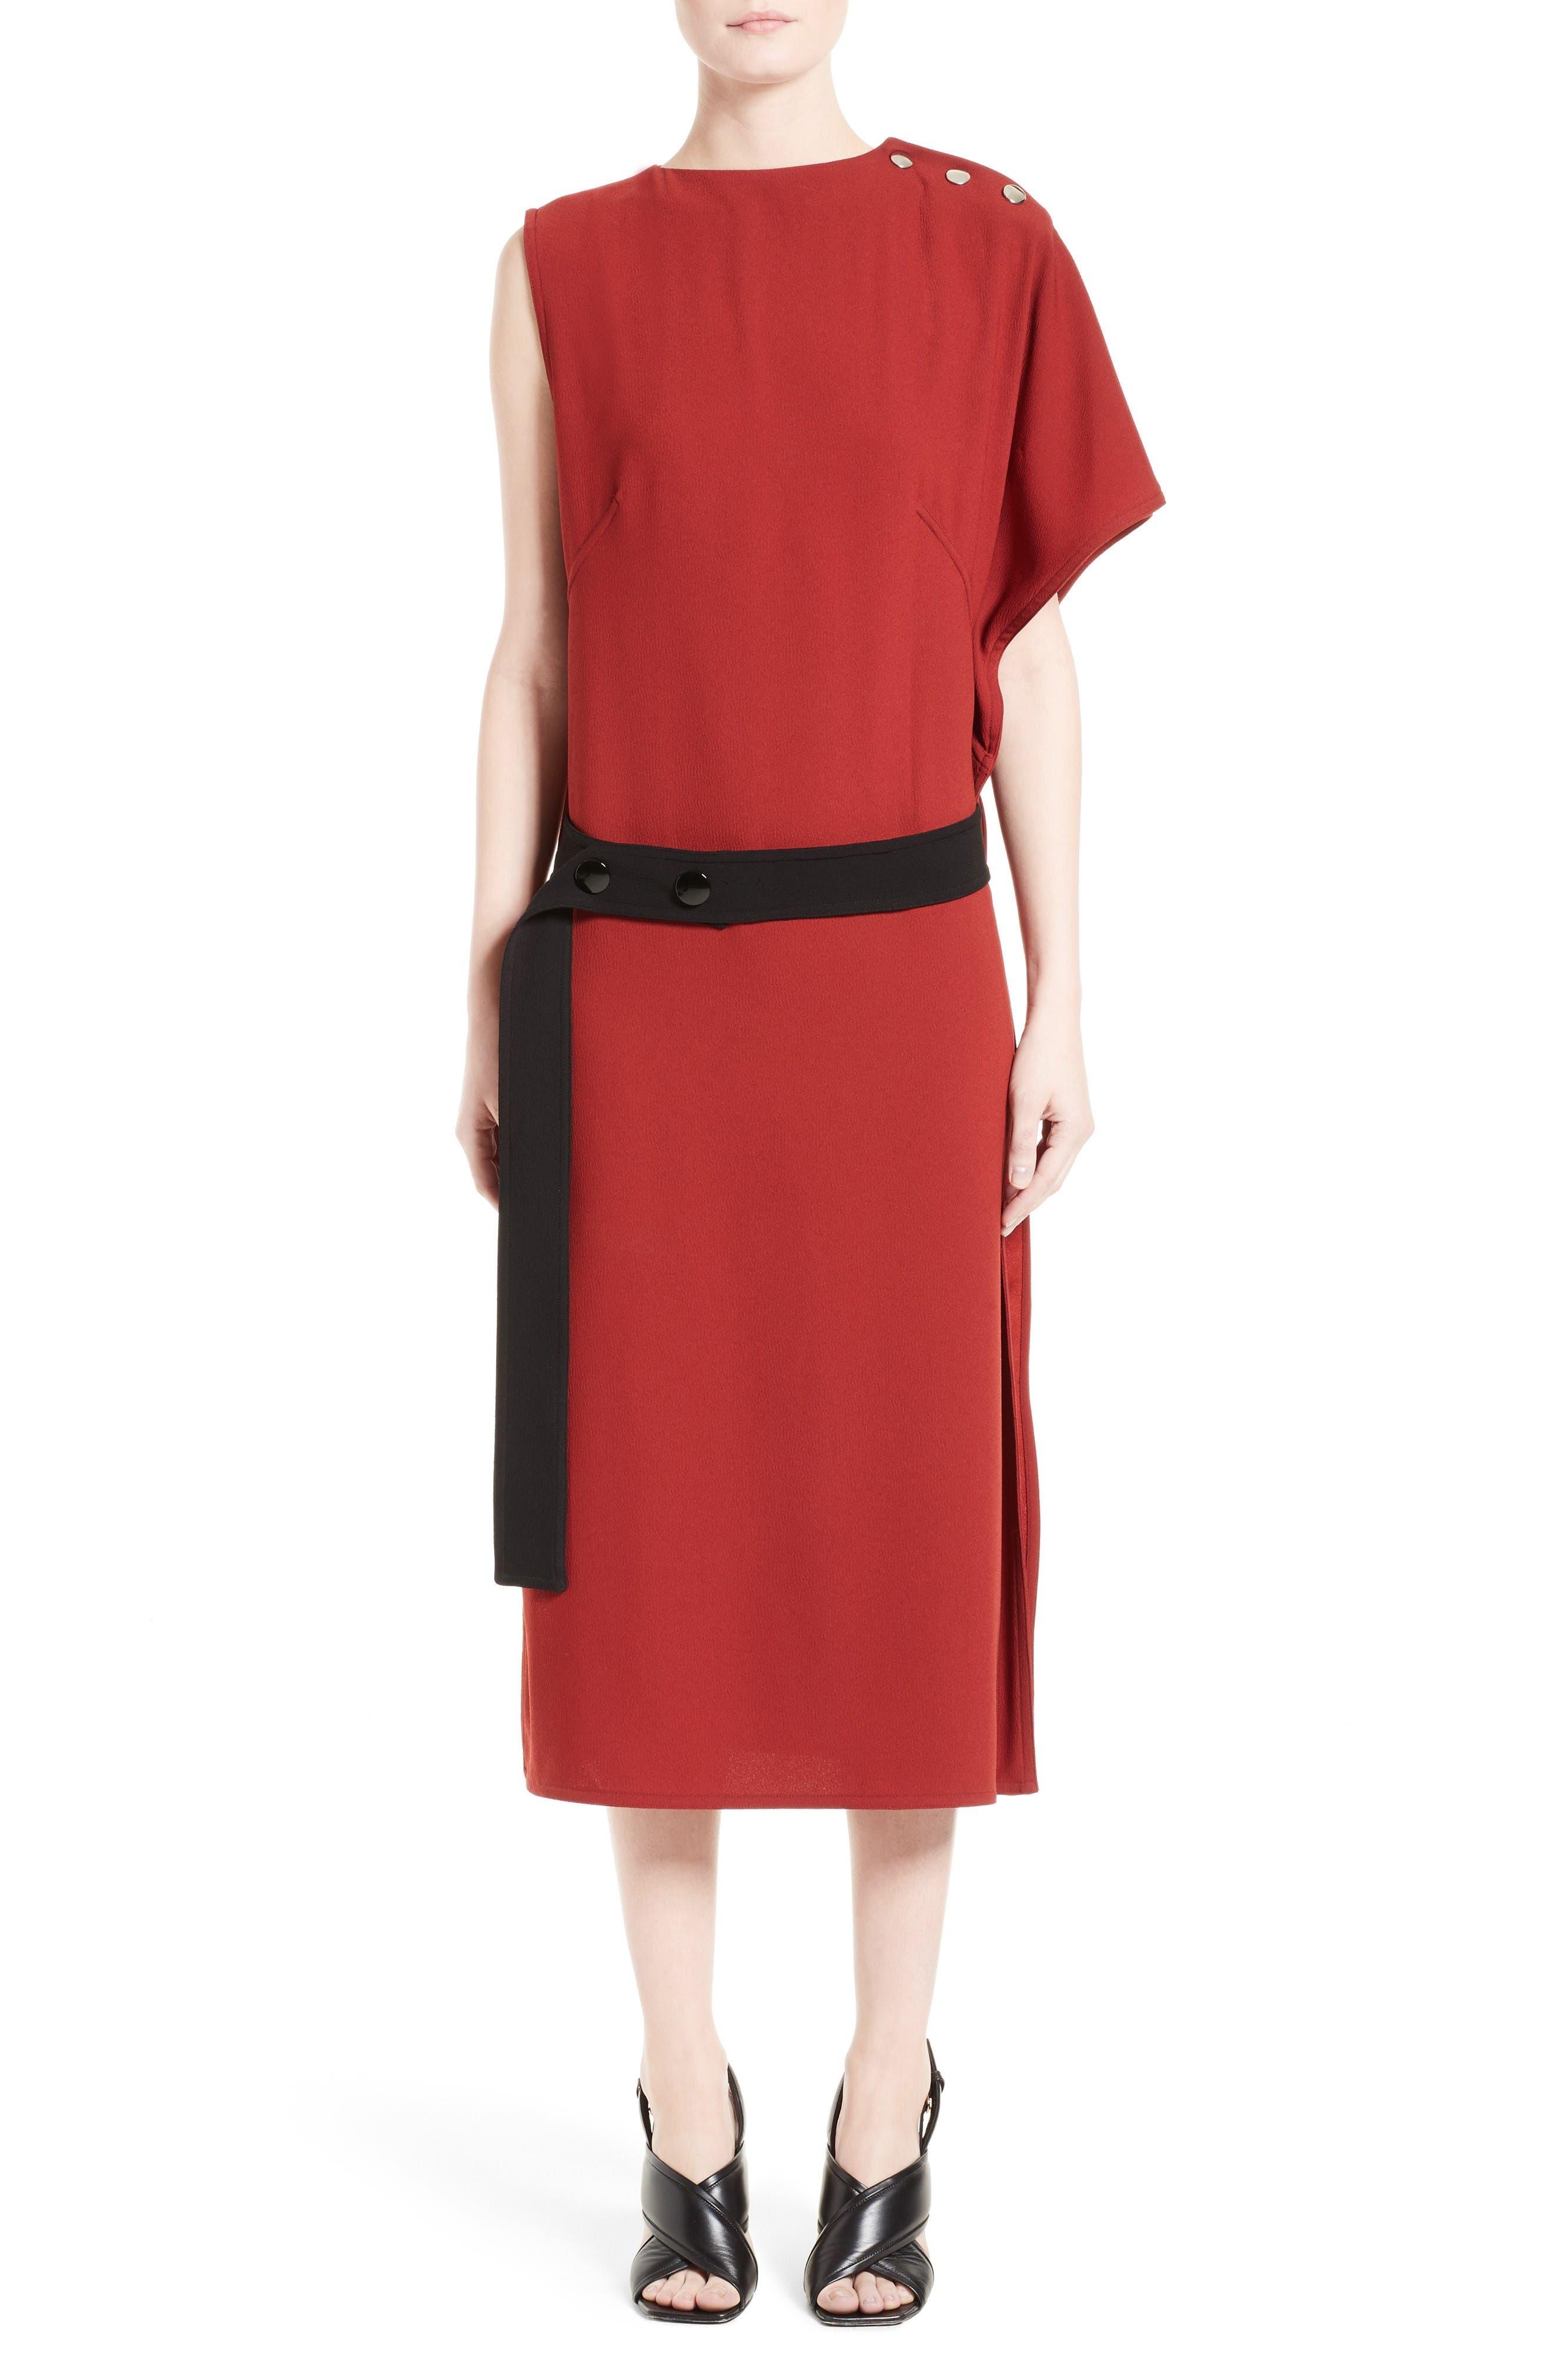 Alternate Image 1 Selected - Marni Crepe Asymmetrical Dress